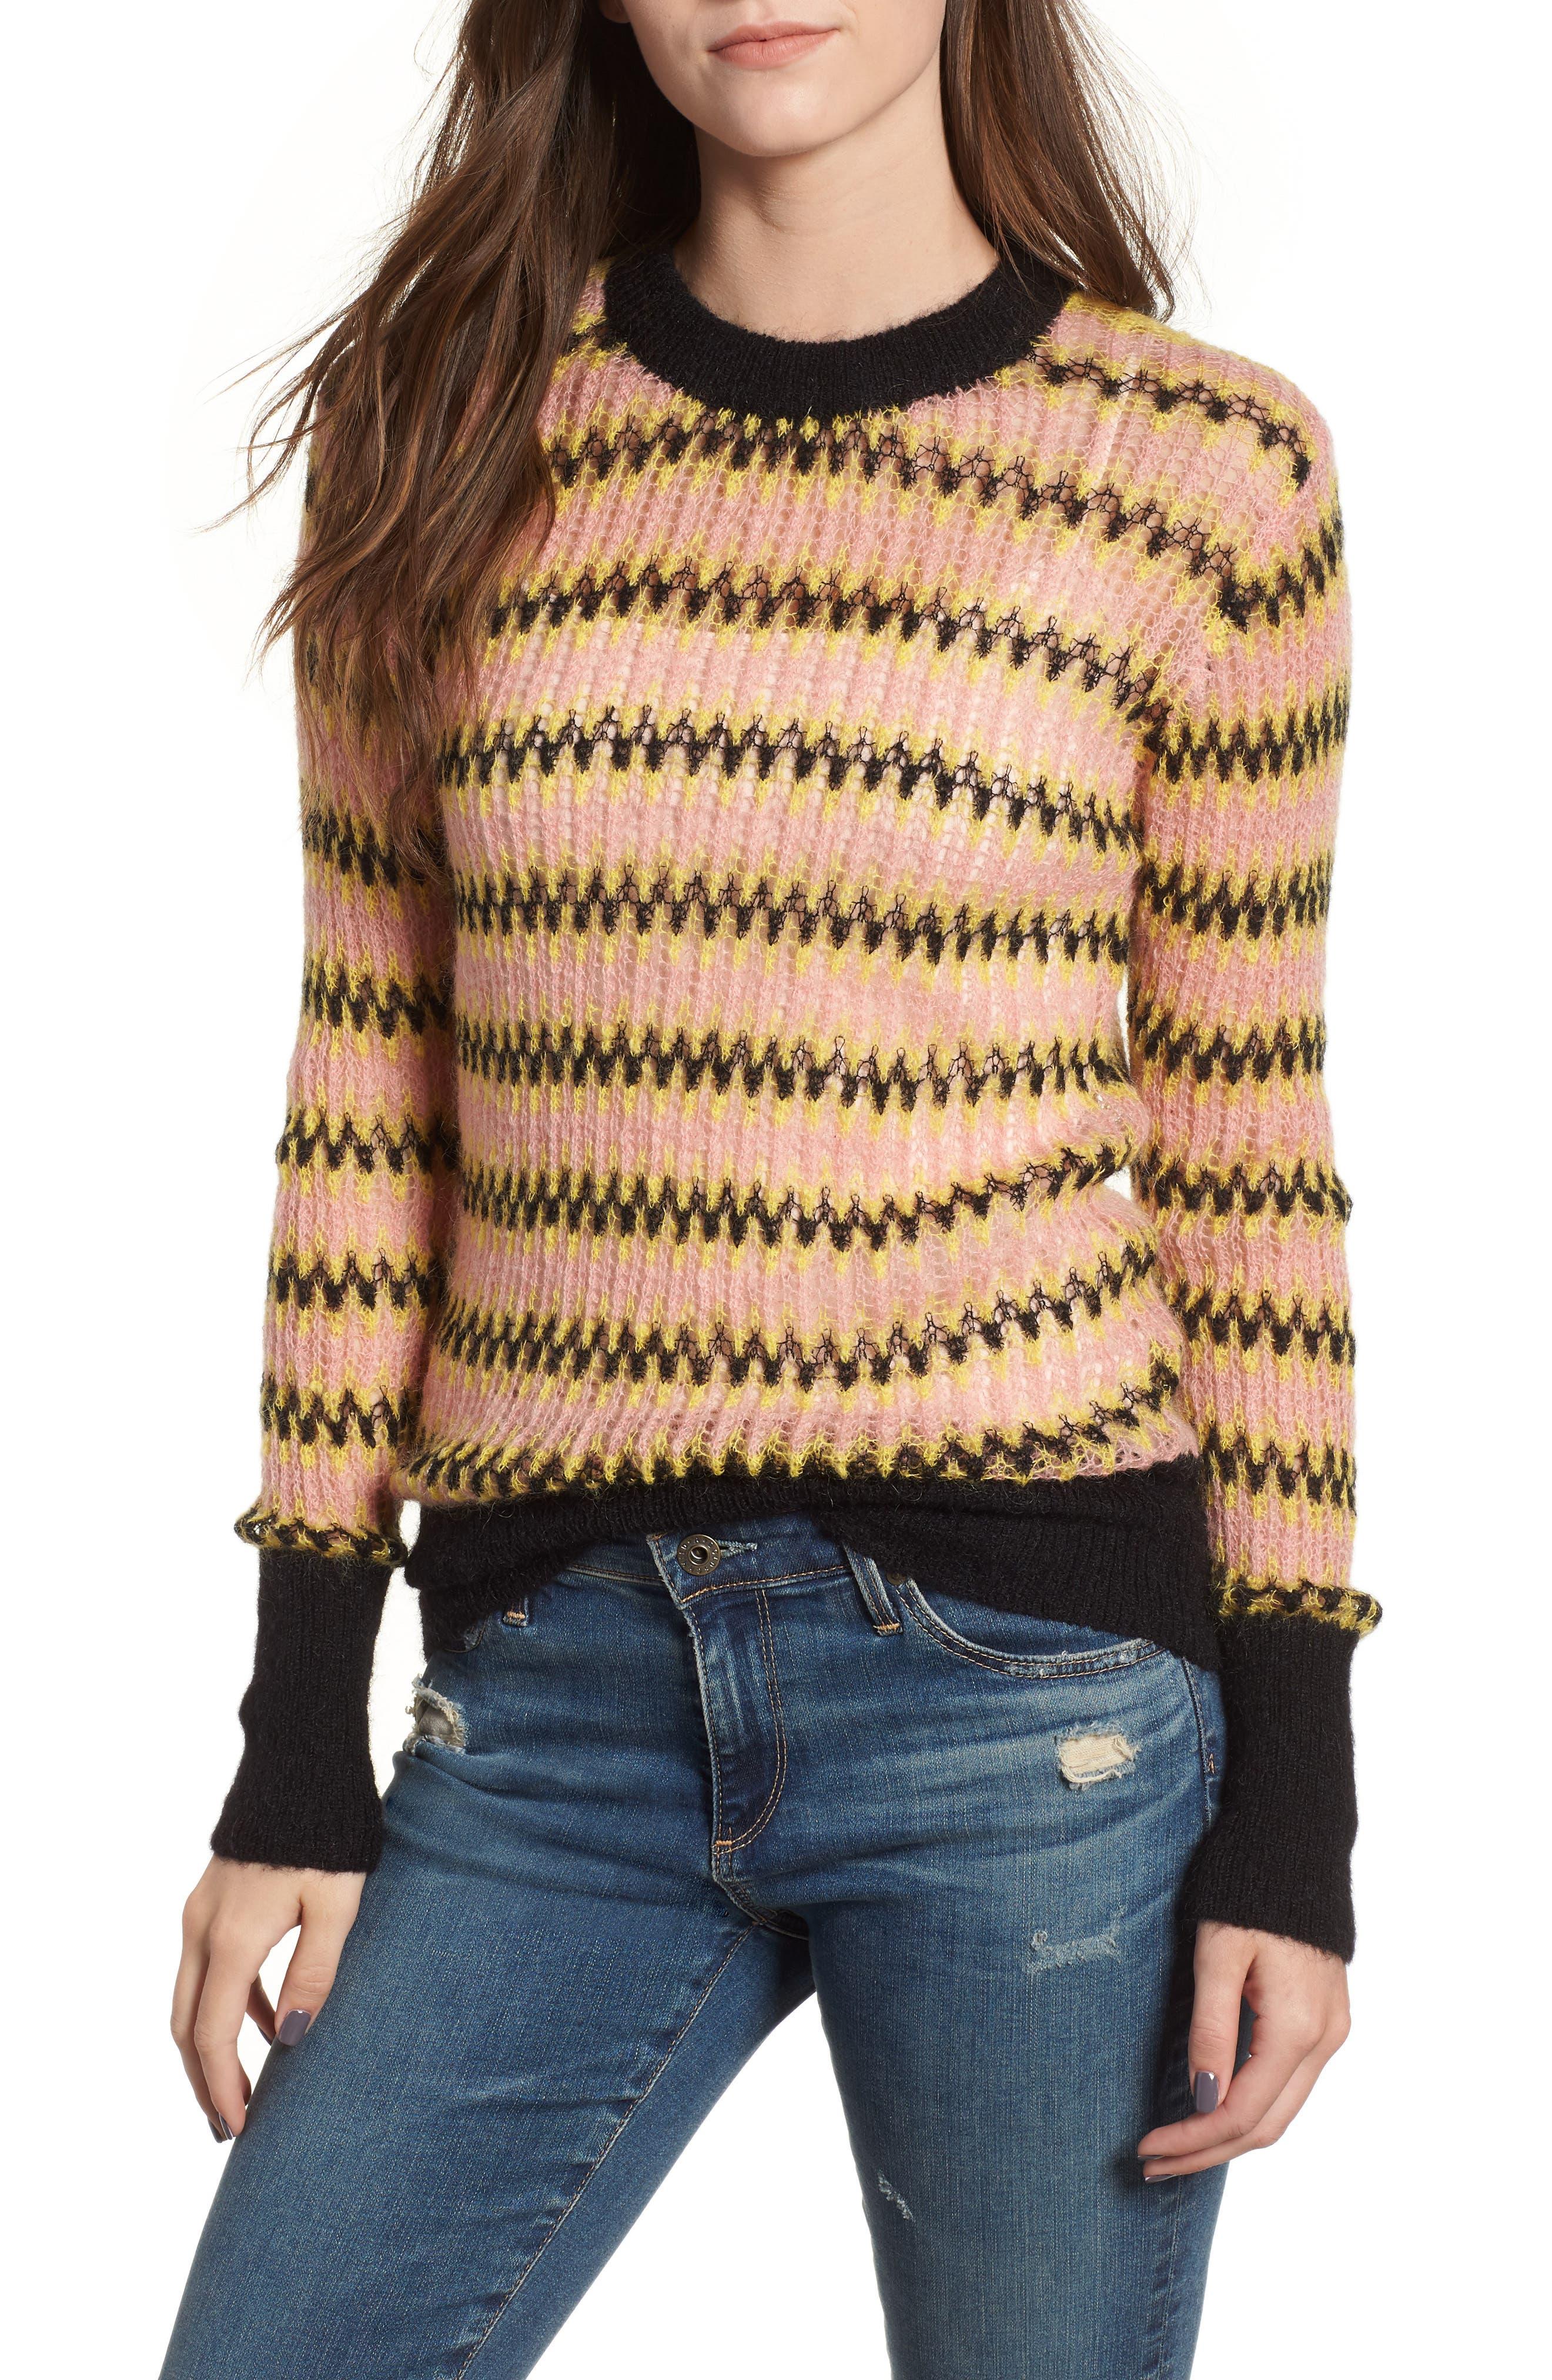 Zig Zag Wool Blend Sweater,                         Main,                         color, MULTI PINK YELLOW ZIGZAG PRINT